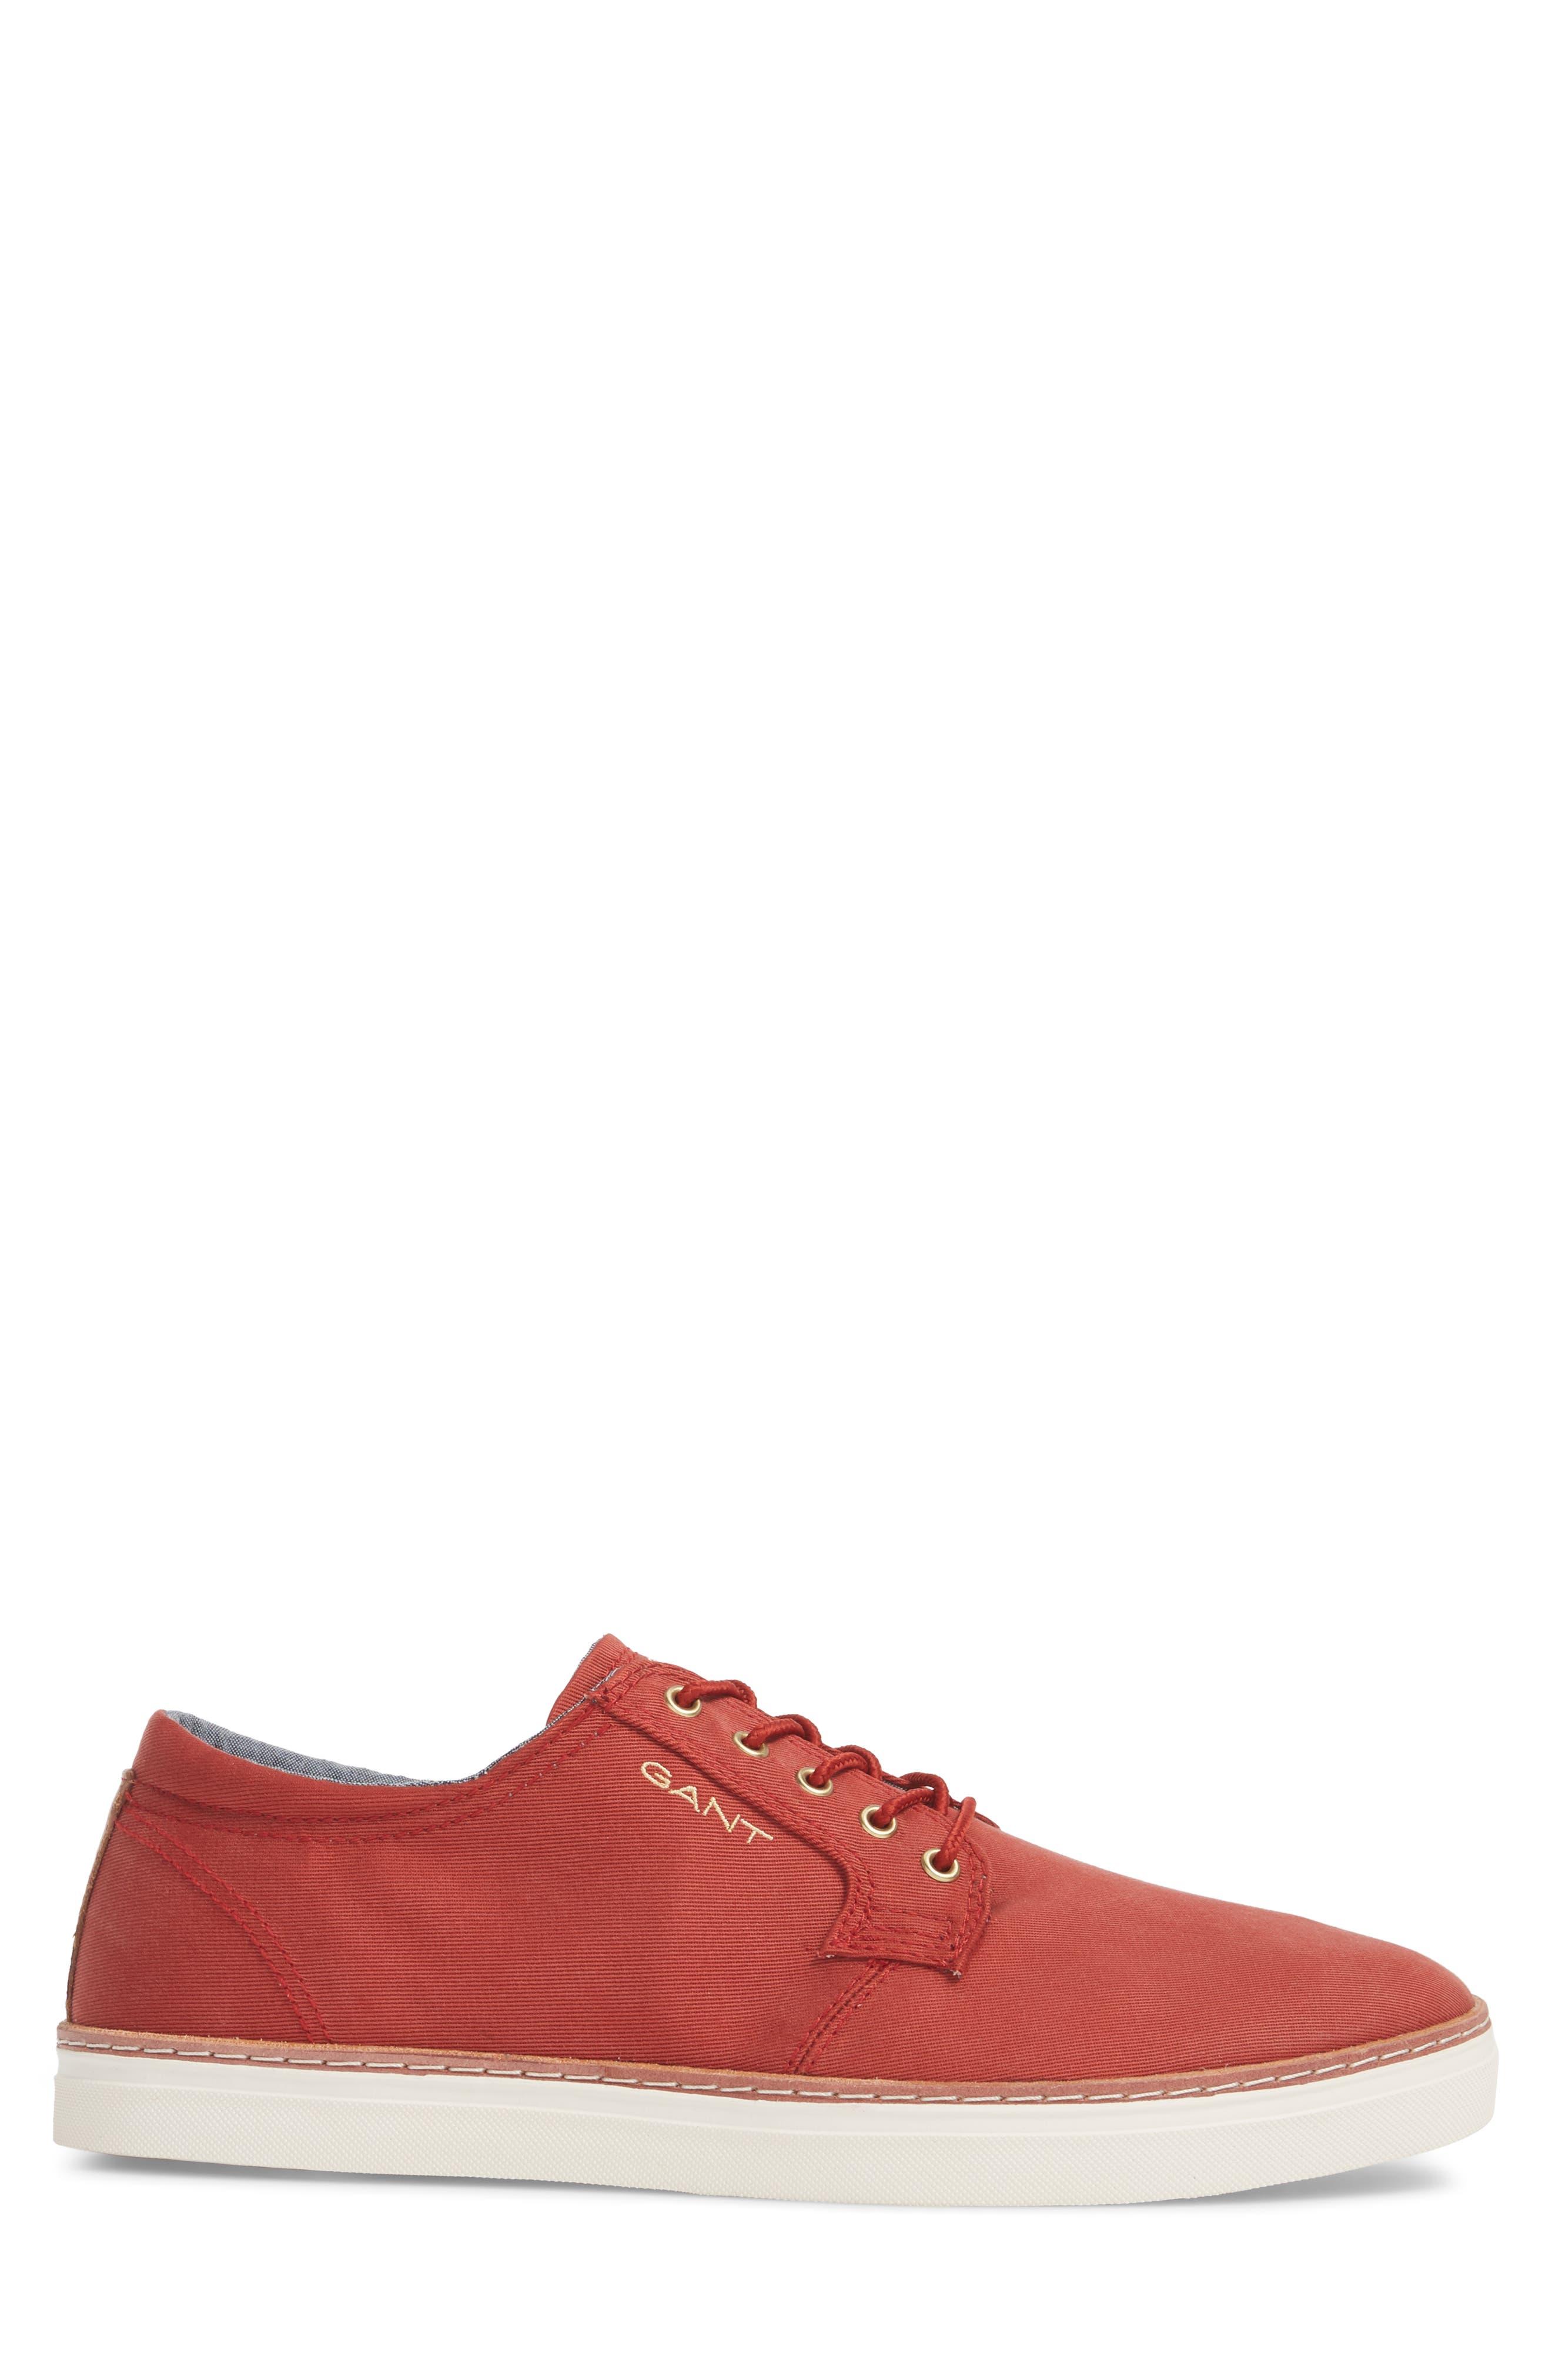 Bari Sneaker,                             Alternate thumbnail 3, color,                             RED TWILL